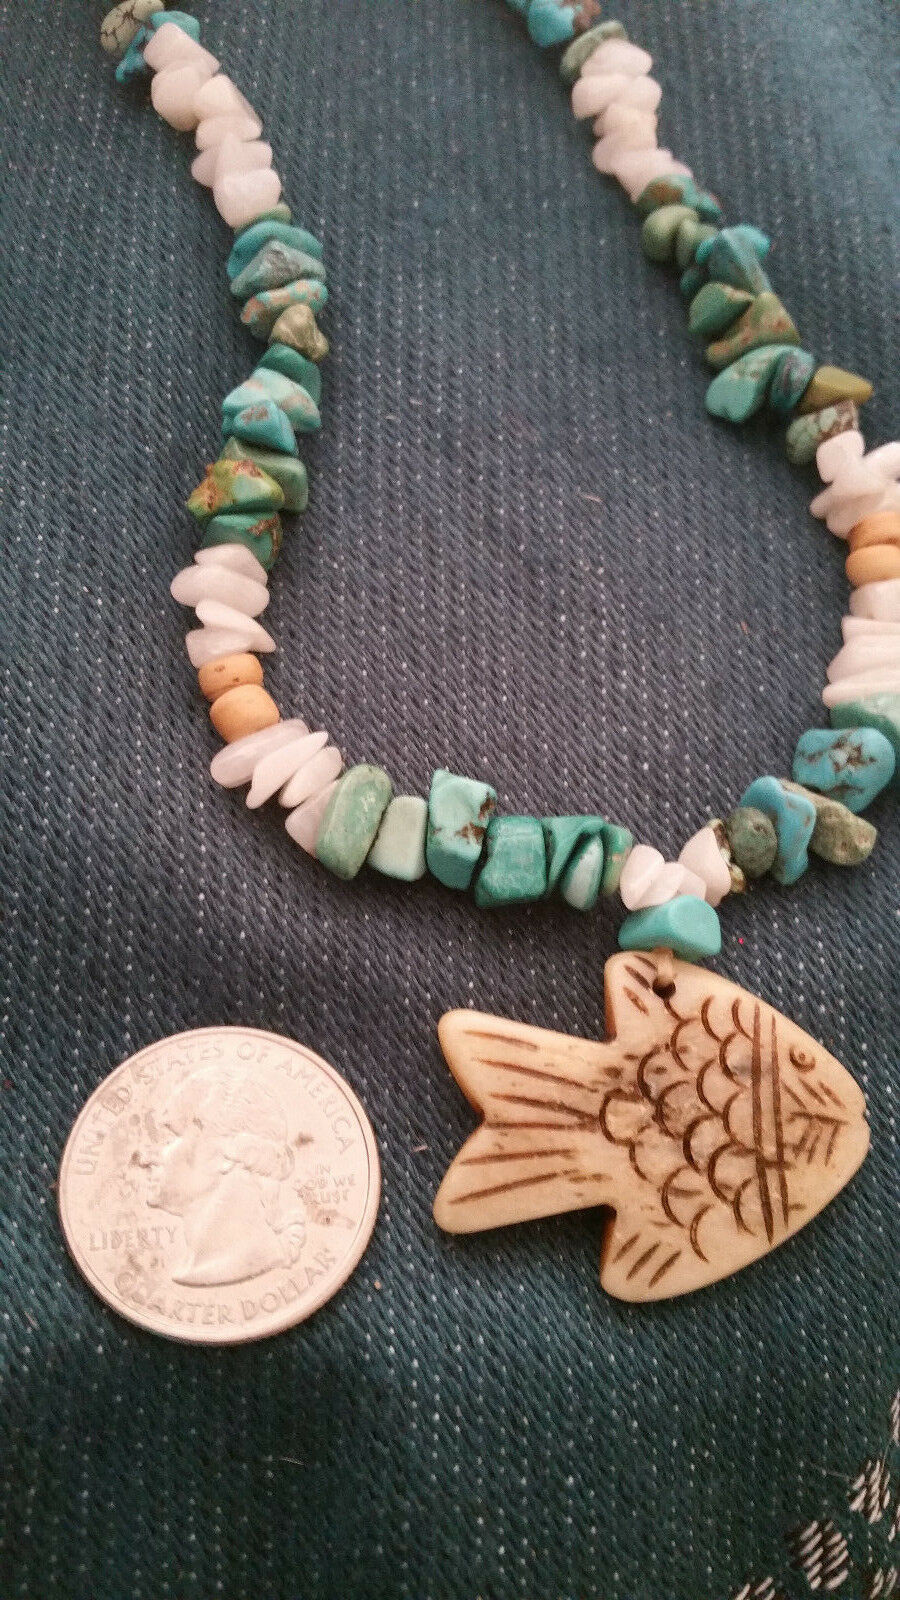 Old Mine Kingman's Turquoise Necklace,w/ Milk quartz, Fish pendant Men or Women image 3